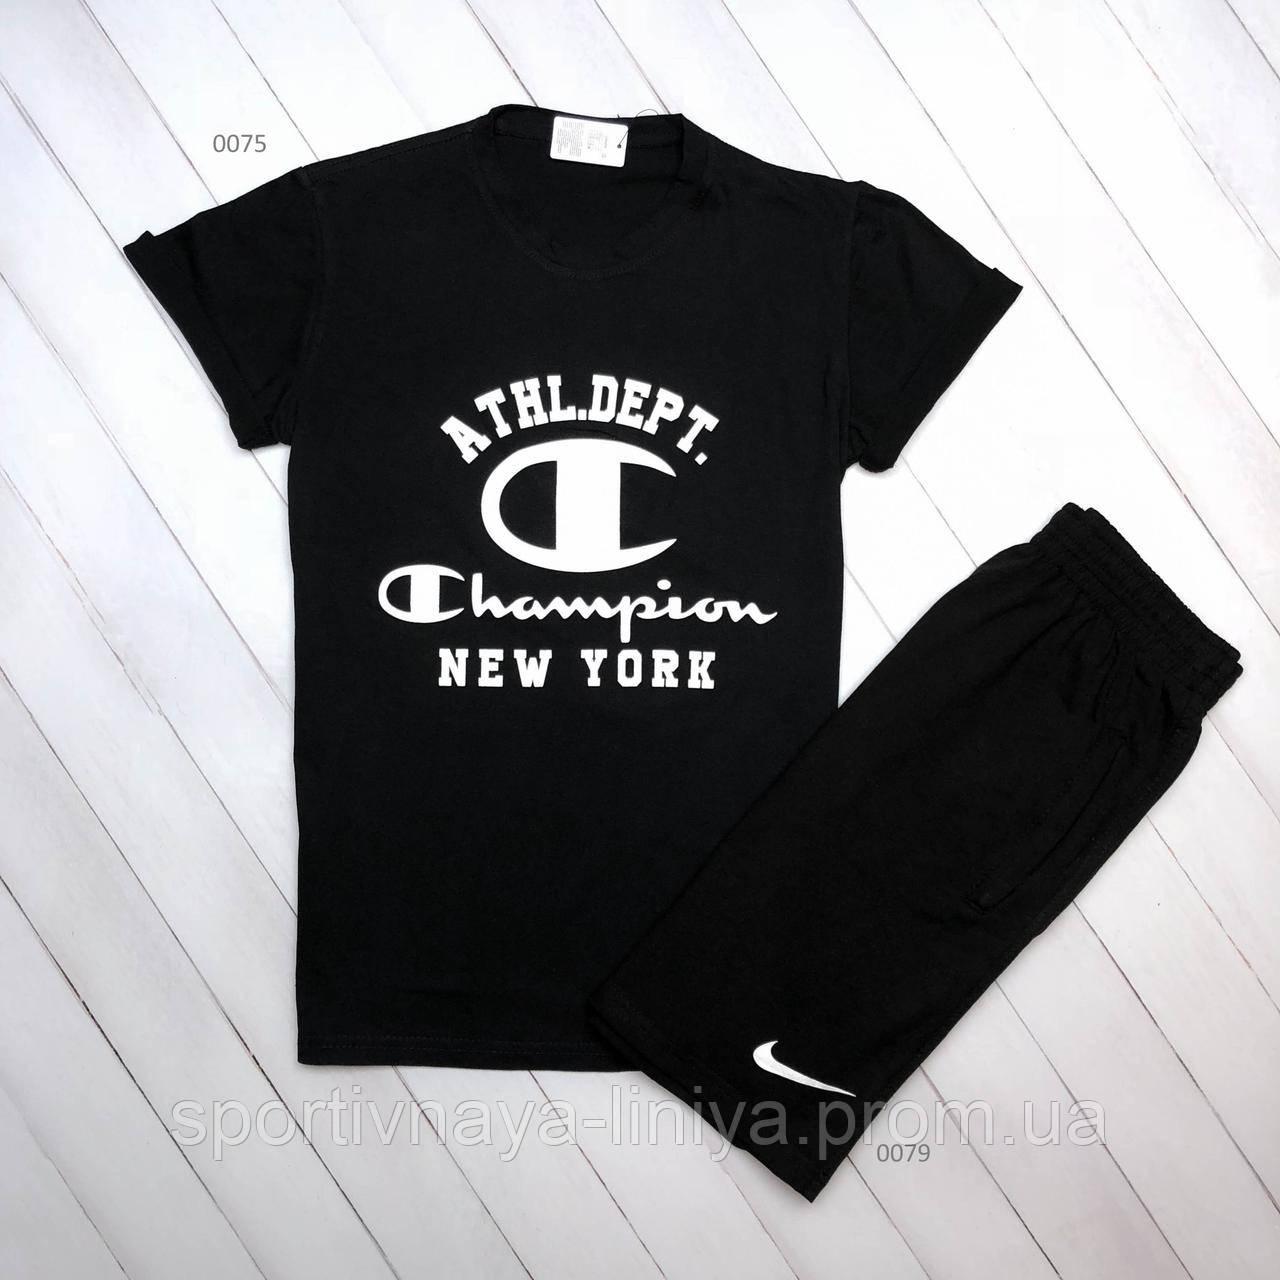 Летняя футболка и шорты Champion (Реплика)